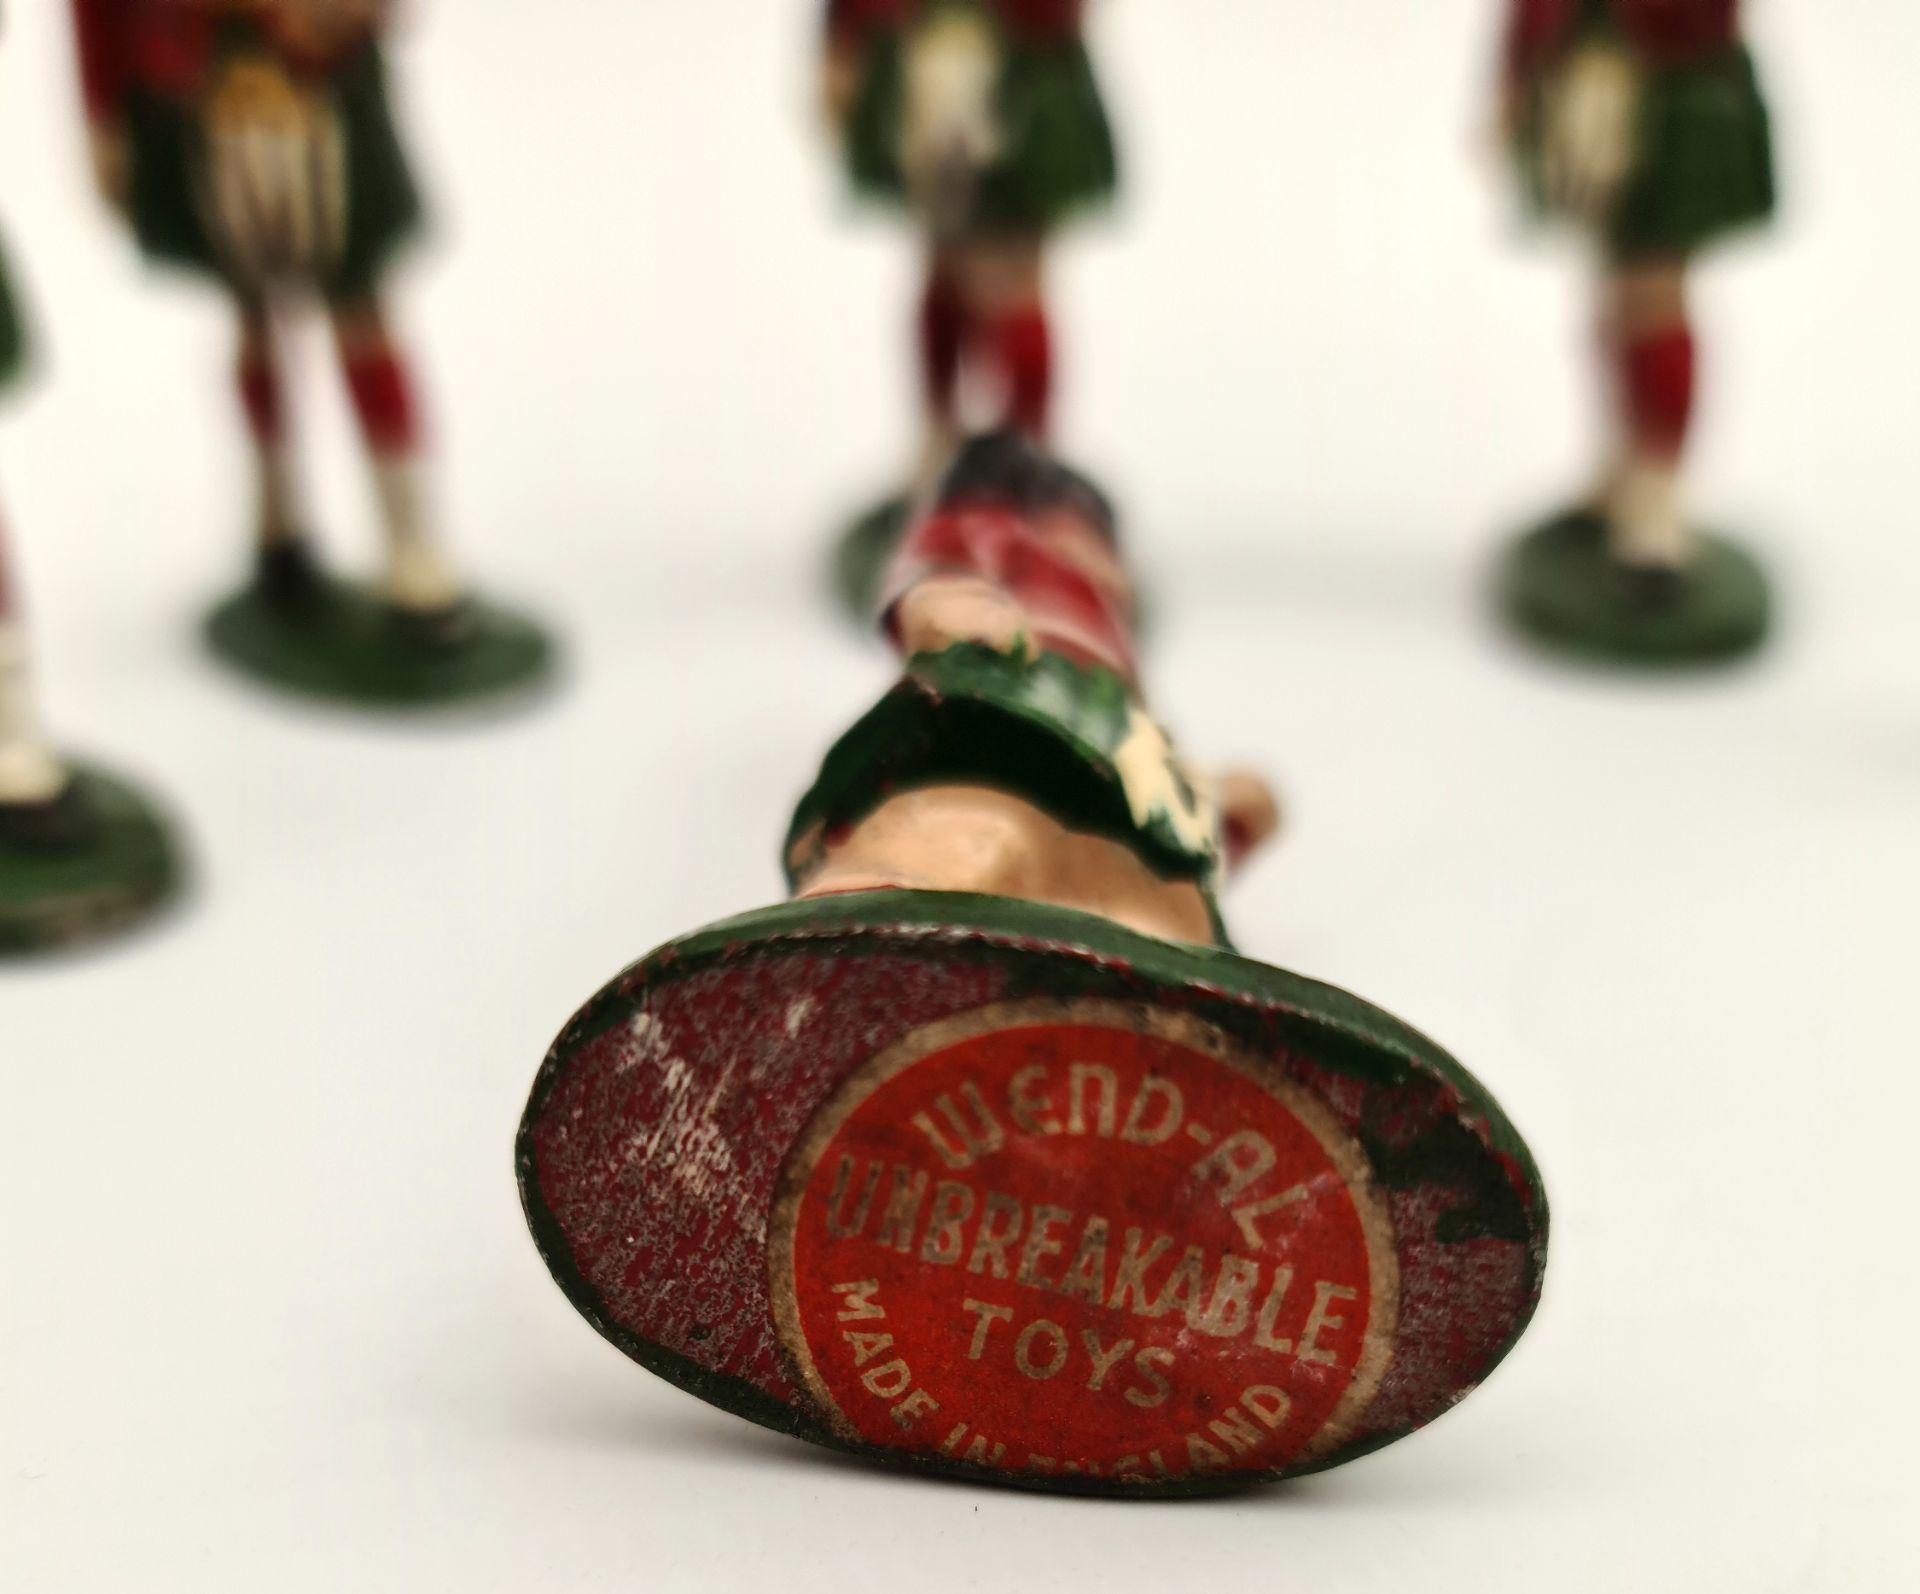 Vintage 6 x Wend-al Metal Toy Soldiers 7cm Tall - Image 2 of 2